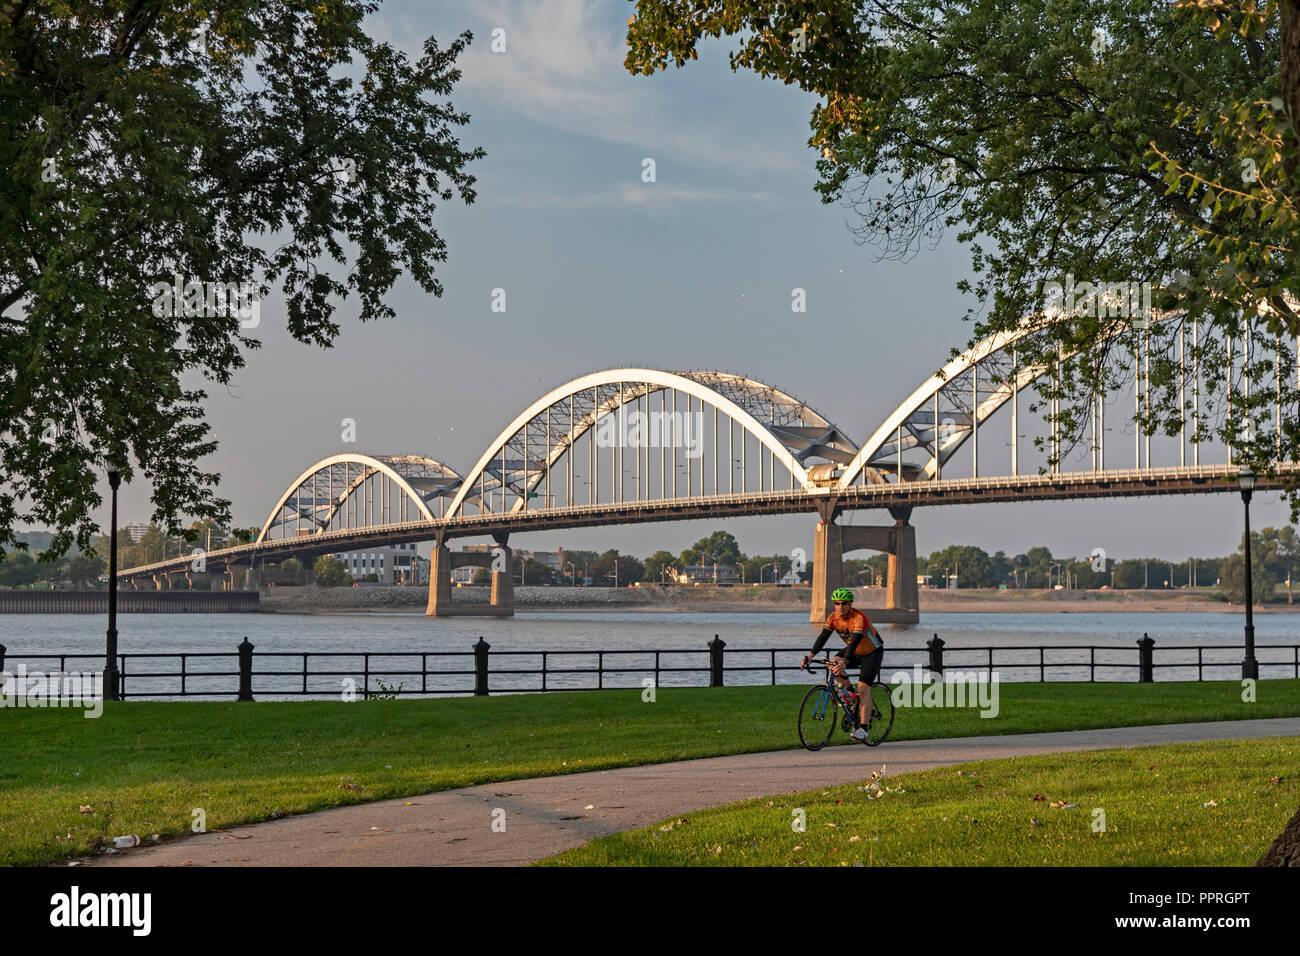 Davenport, Iowa - The Rock Island Centennial Bridge connects Davenport, Iowa (foreground) with Rock Island, Illinois across the Mississippi River. - Stock Image